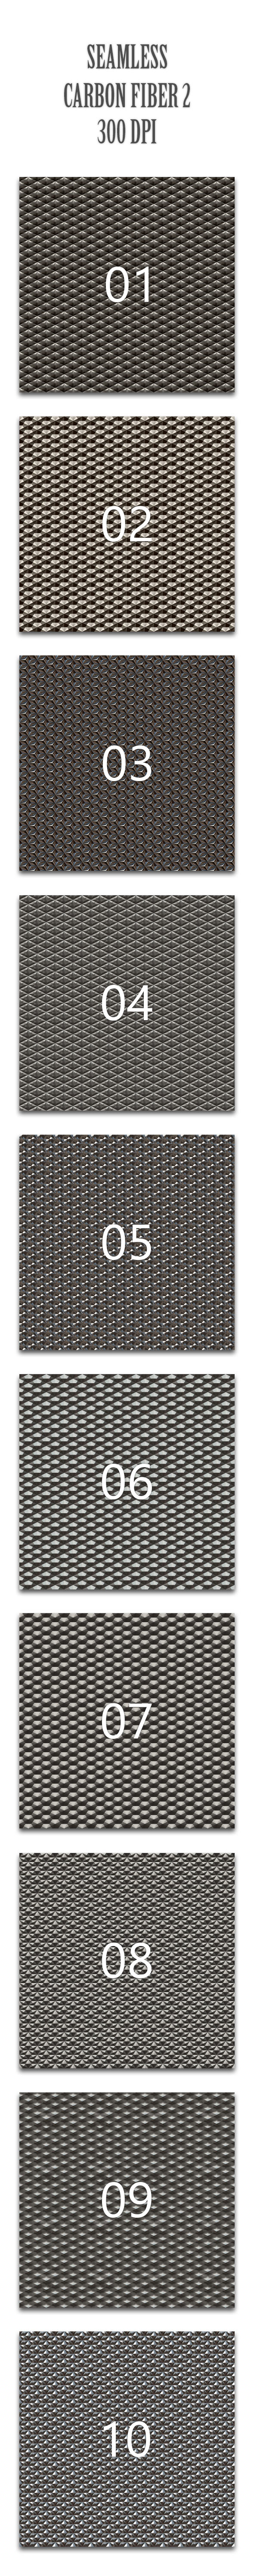 Seamless Carbon Fiber 2 - Techno / Futuristic Textures / Fills / Patterns